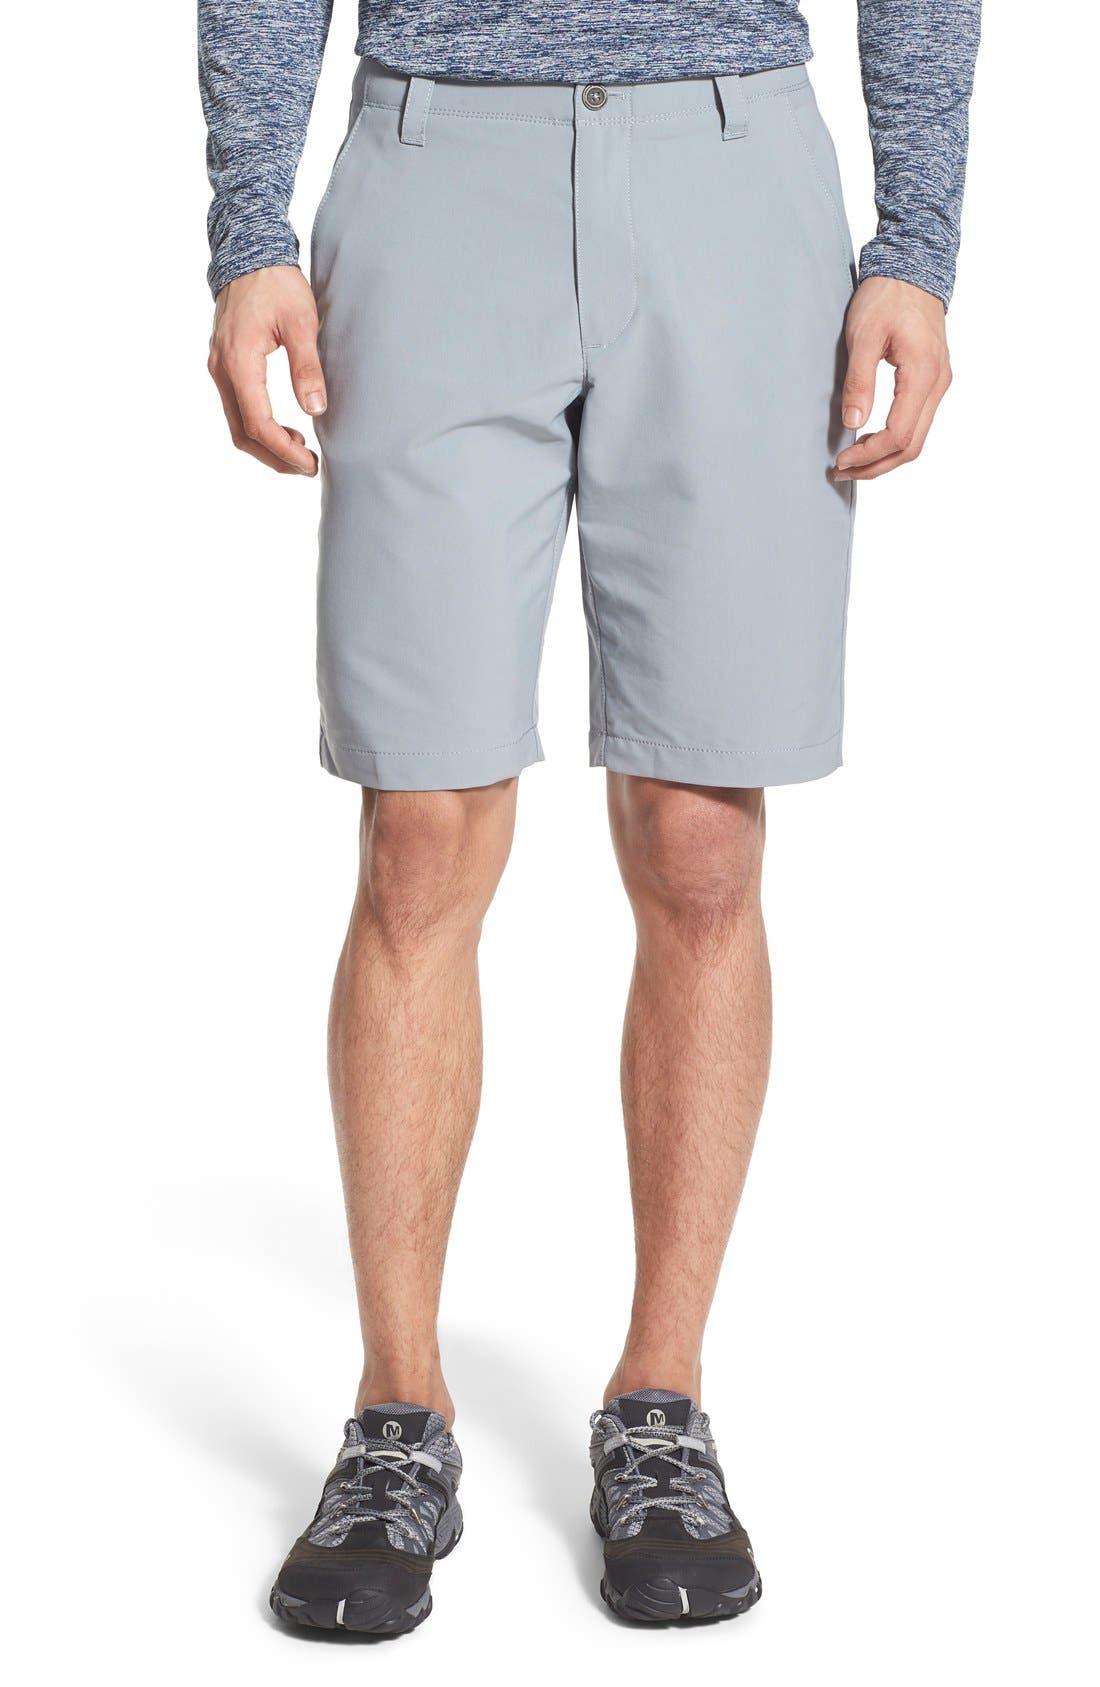 'Matchplay' Moisture Wicking Golf Shorts,                             Alternate thumbnail 7, color,                             035